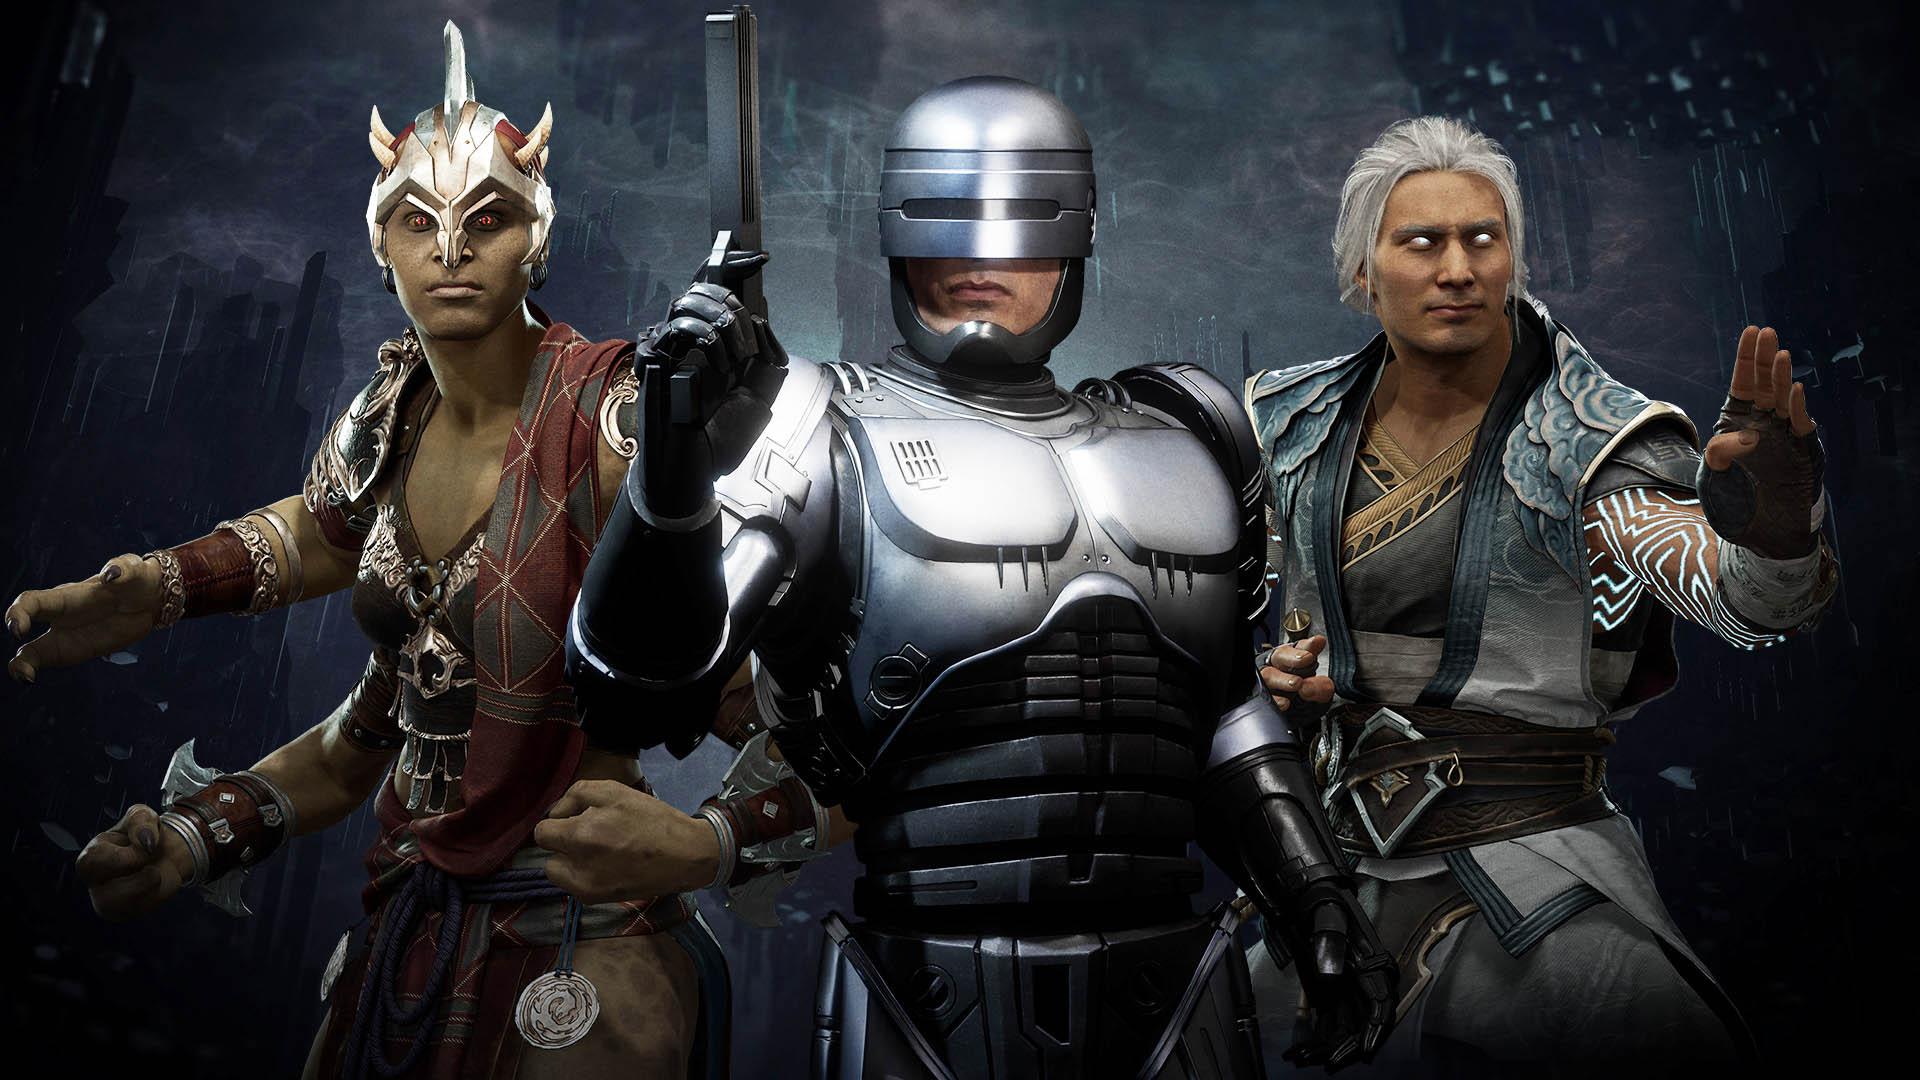 Mortal Kombat 11 PC, PS4, XONE, Switch Games Image 17/17, NetherRealm Studios , Warner Bros. Interactive Entertainment